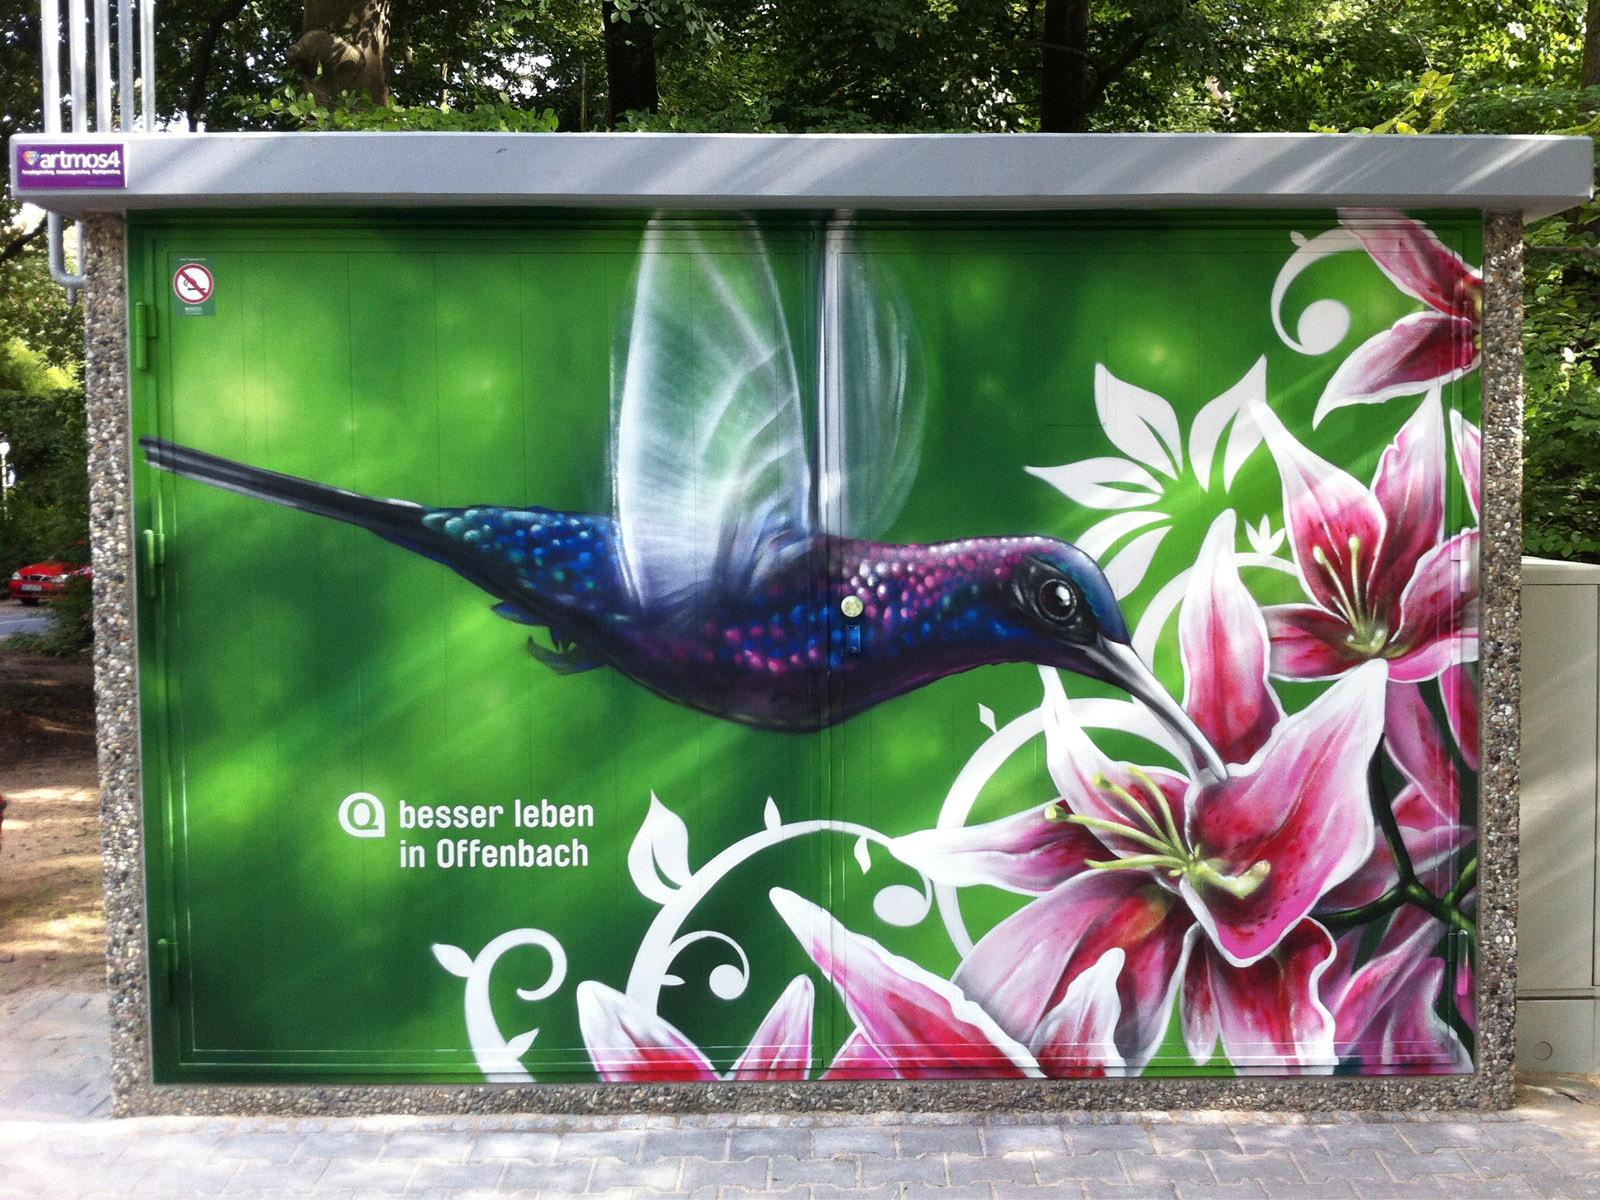 graffitikuenstler_graffitiauftrag_artmos4_energieversorger_offenbach_tier_pflanzen_bunt